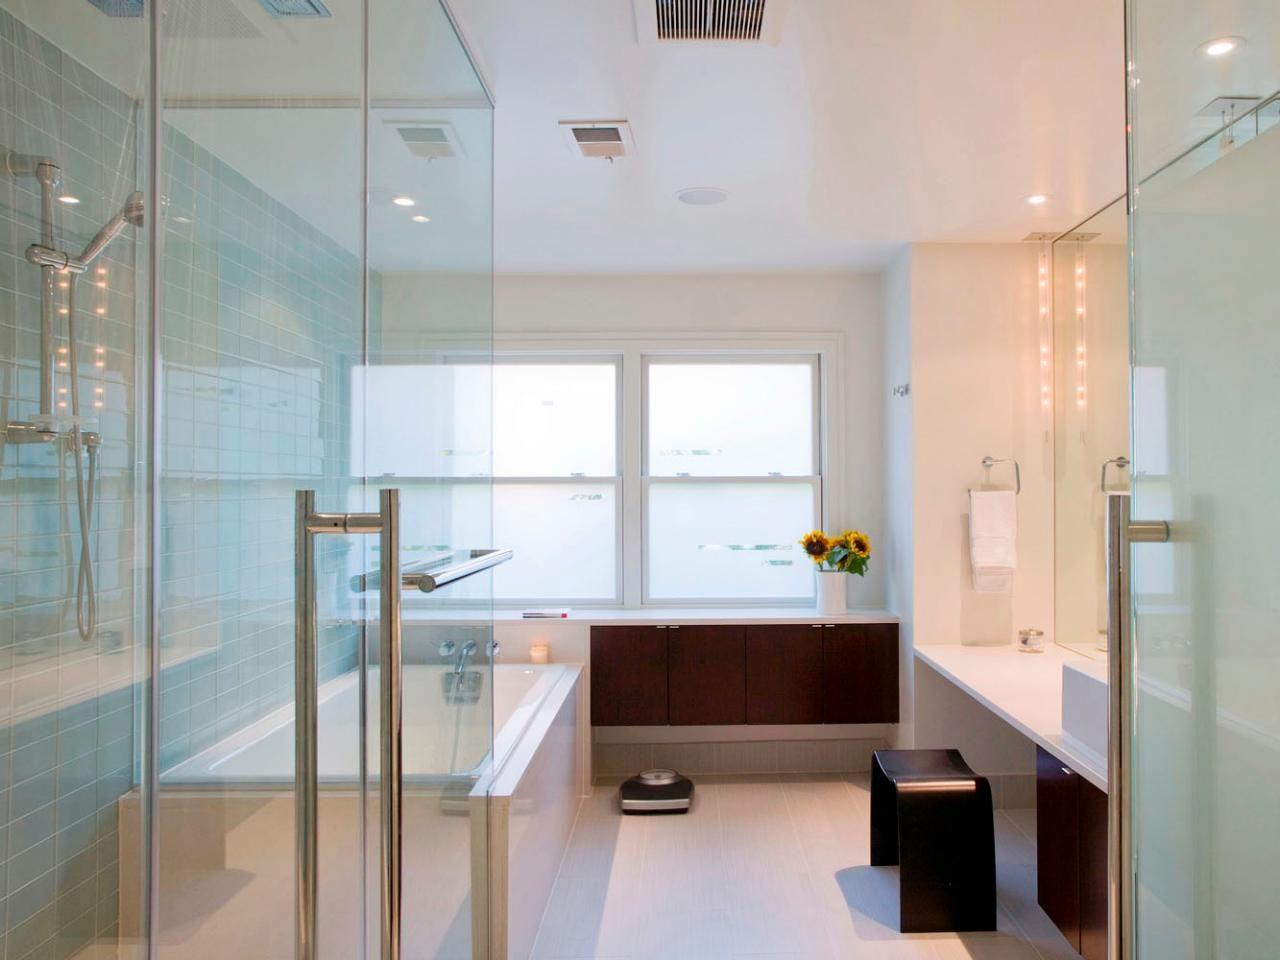 Spainspired Master Bathrooms  Master Bathrooms Hgtv And Enchanting Spa Bathroom Remodel 2018